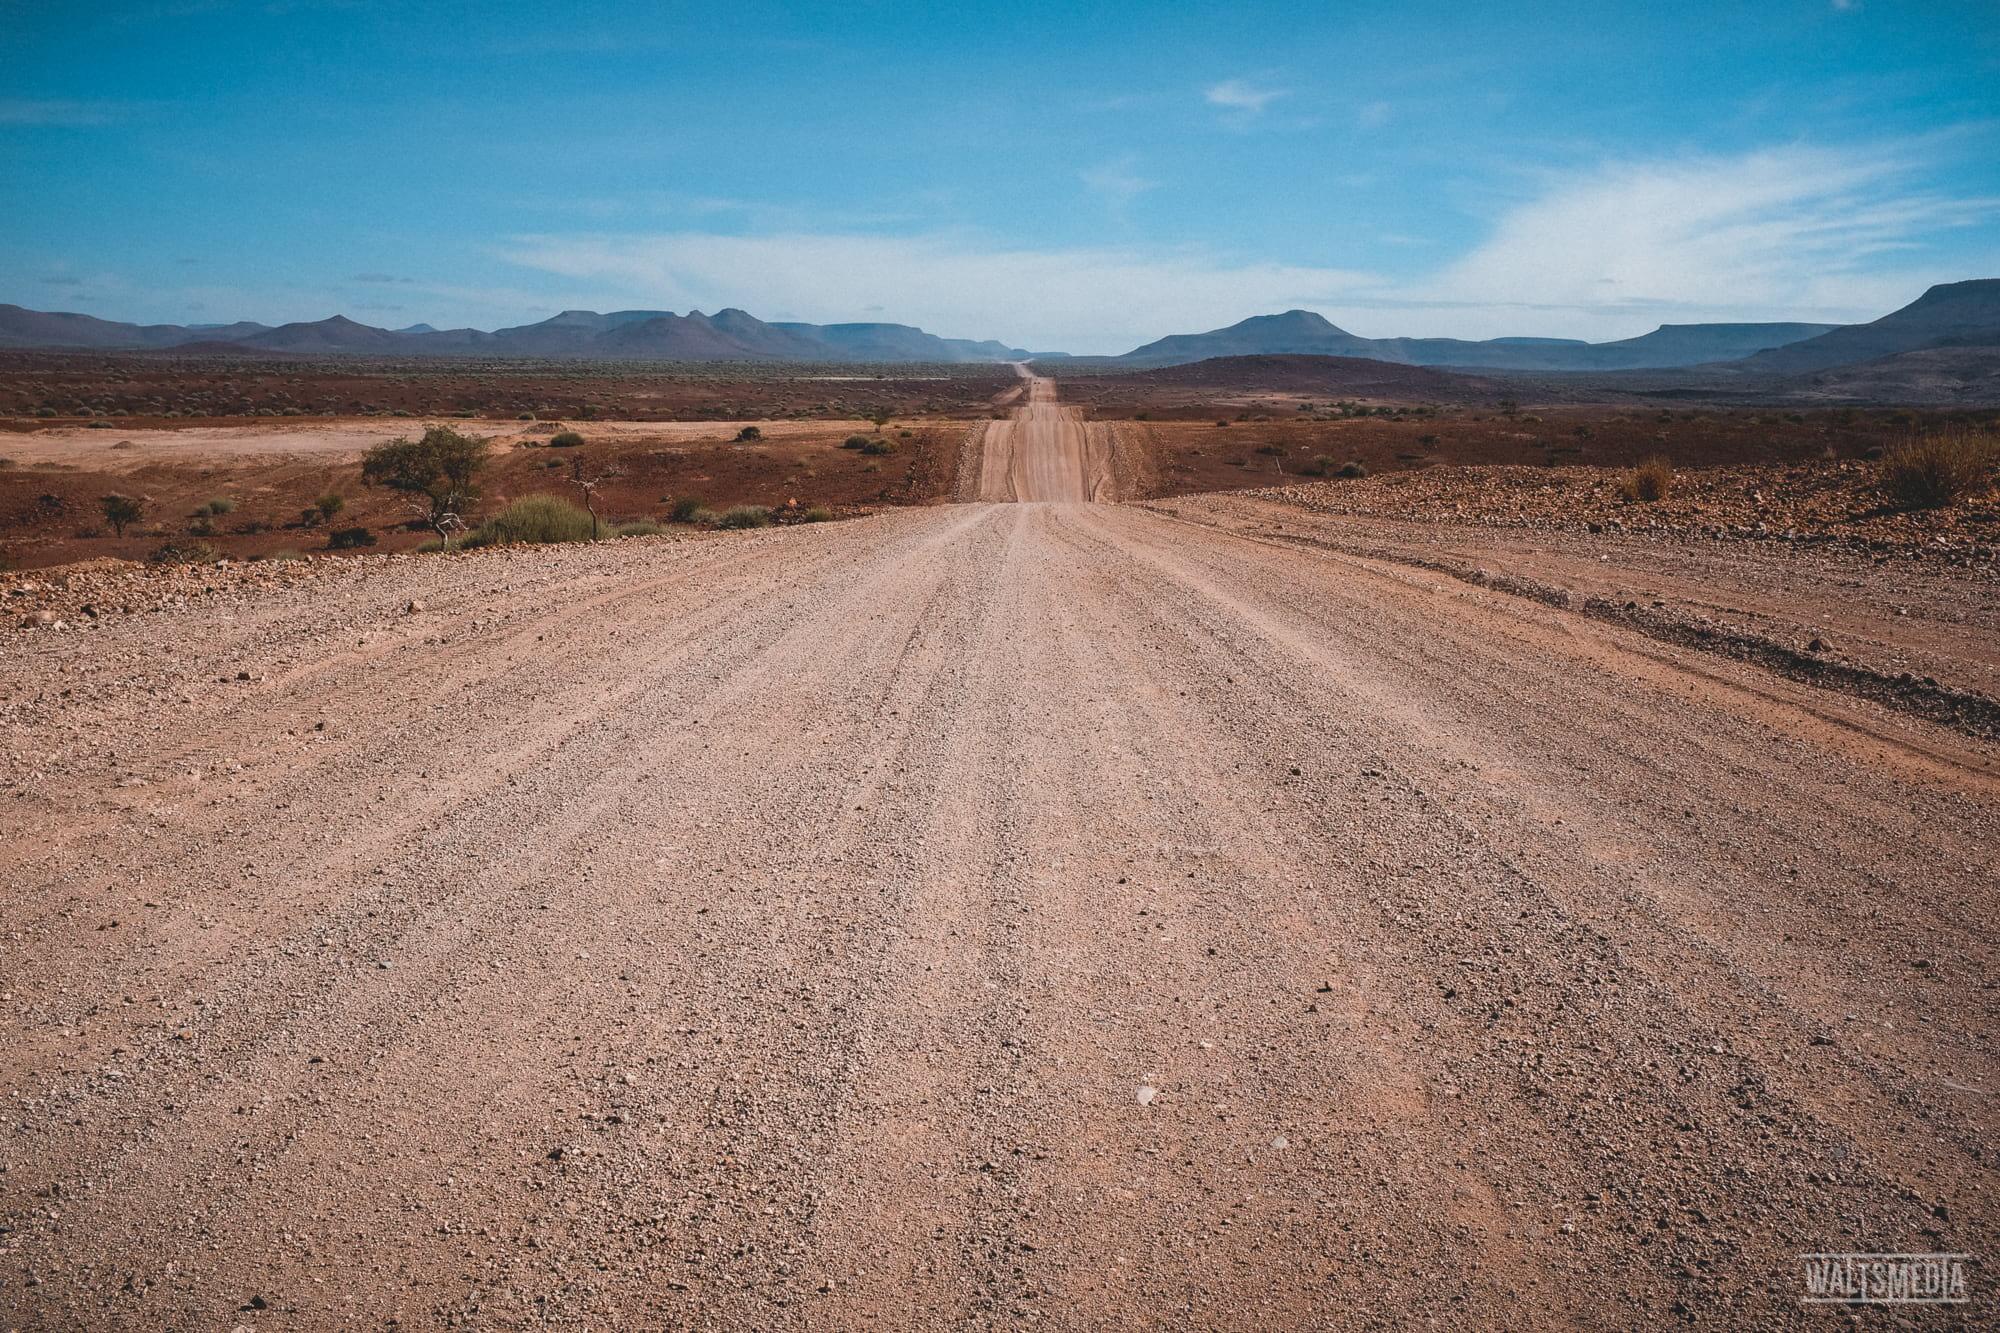 waltsmedia-namibia-travel-portrait-65-40